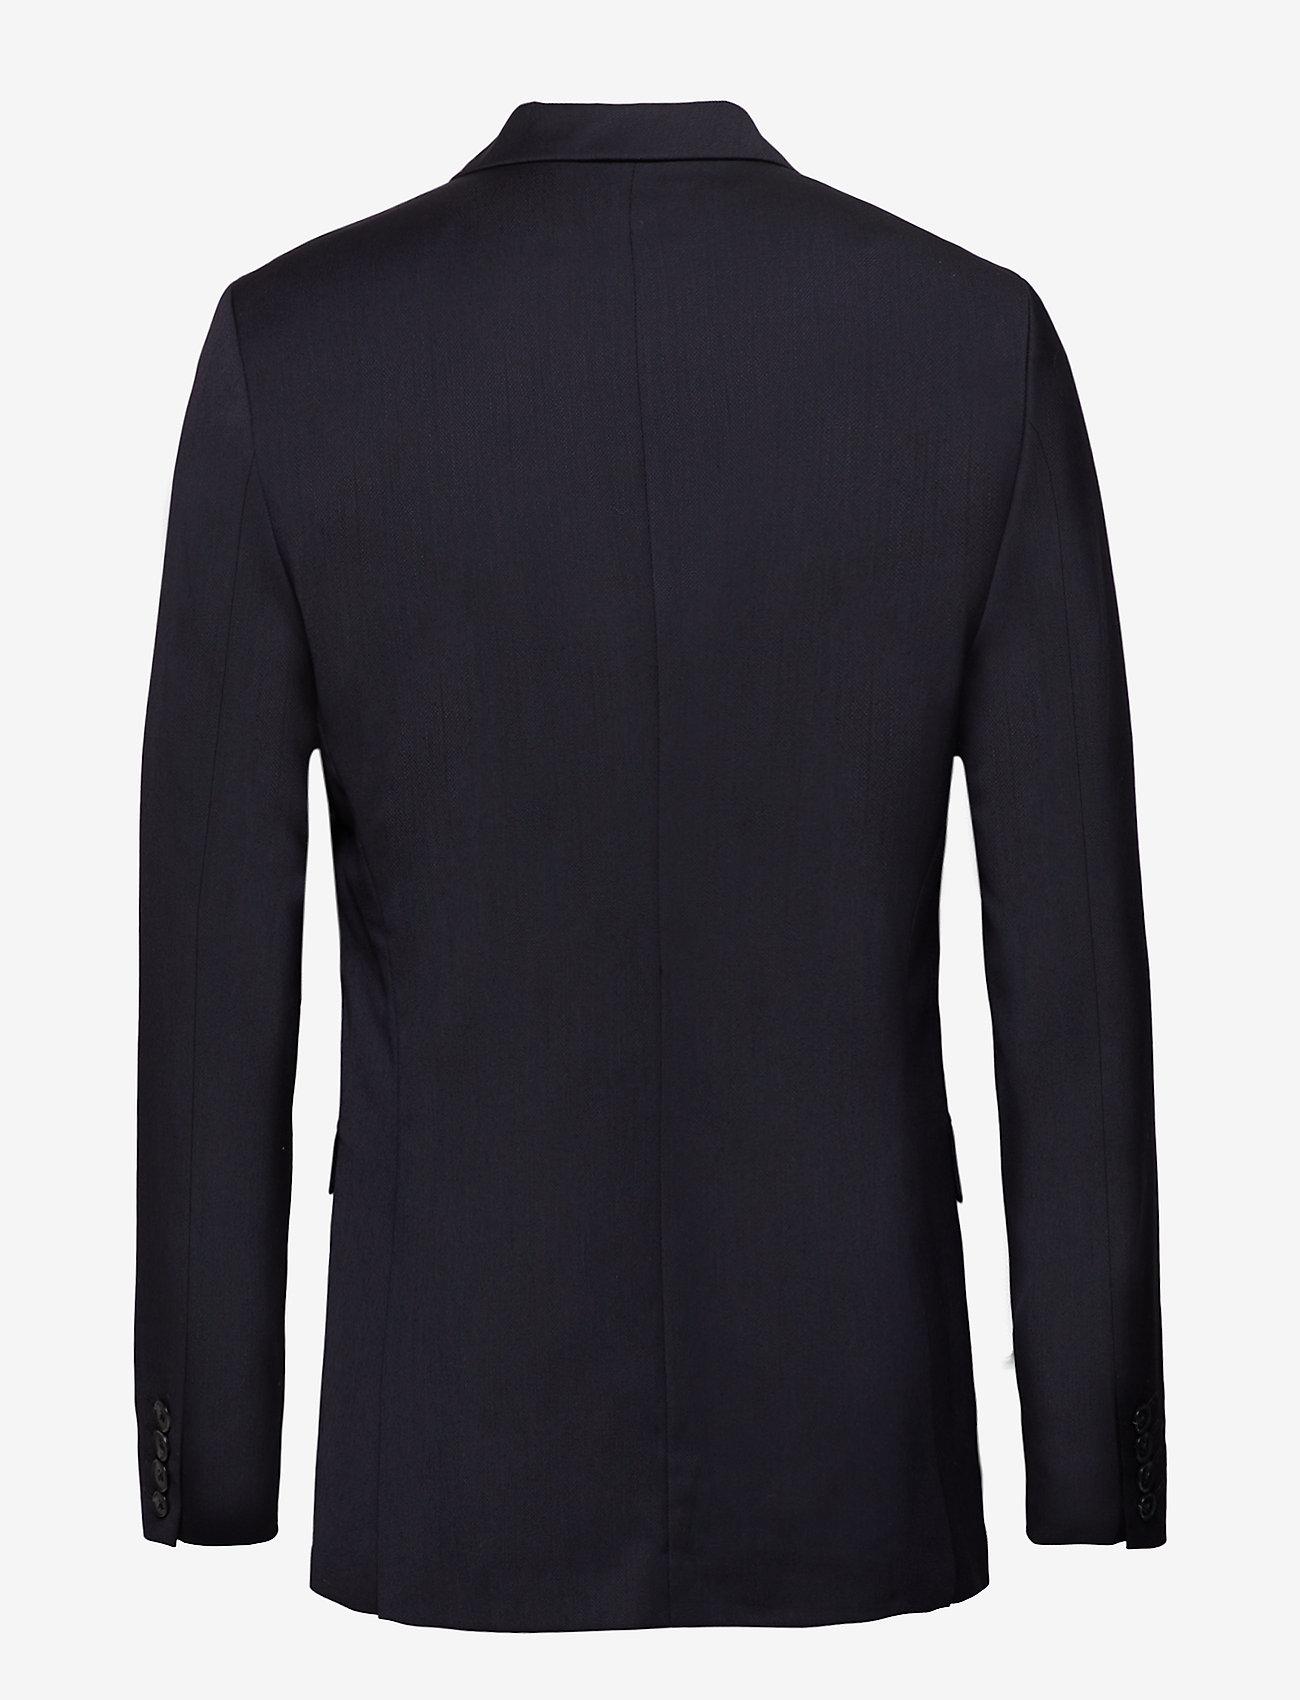 Selected Homme - SLHSLIM-MYLOBILL NAVY BLAZER B - single breasted blazers - navy blazer - 1